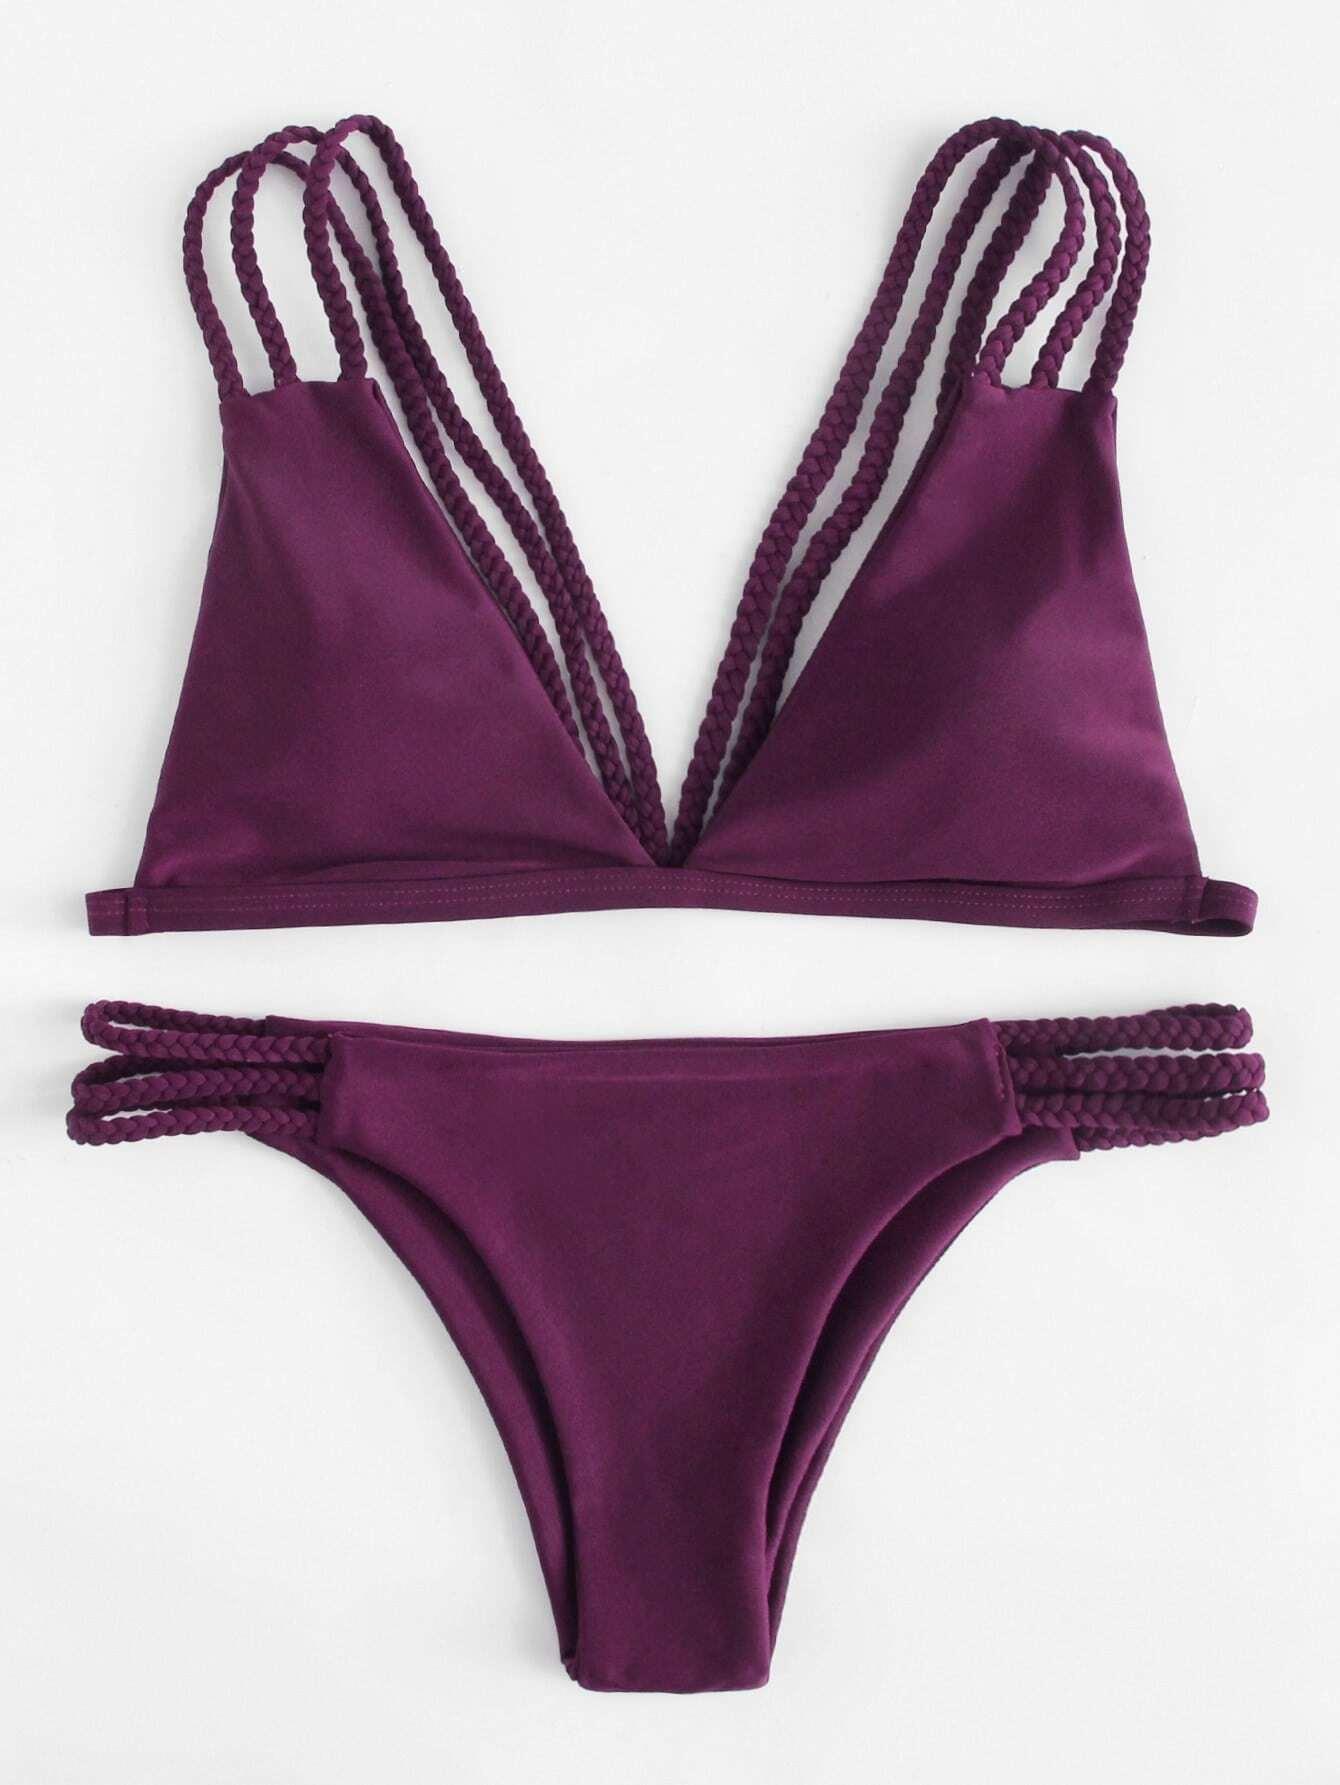 Фото Braided Straps Bikini Set checker knot bikini set